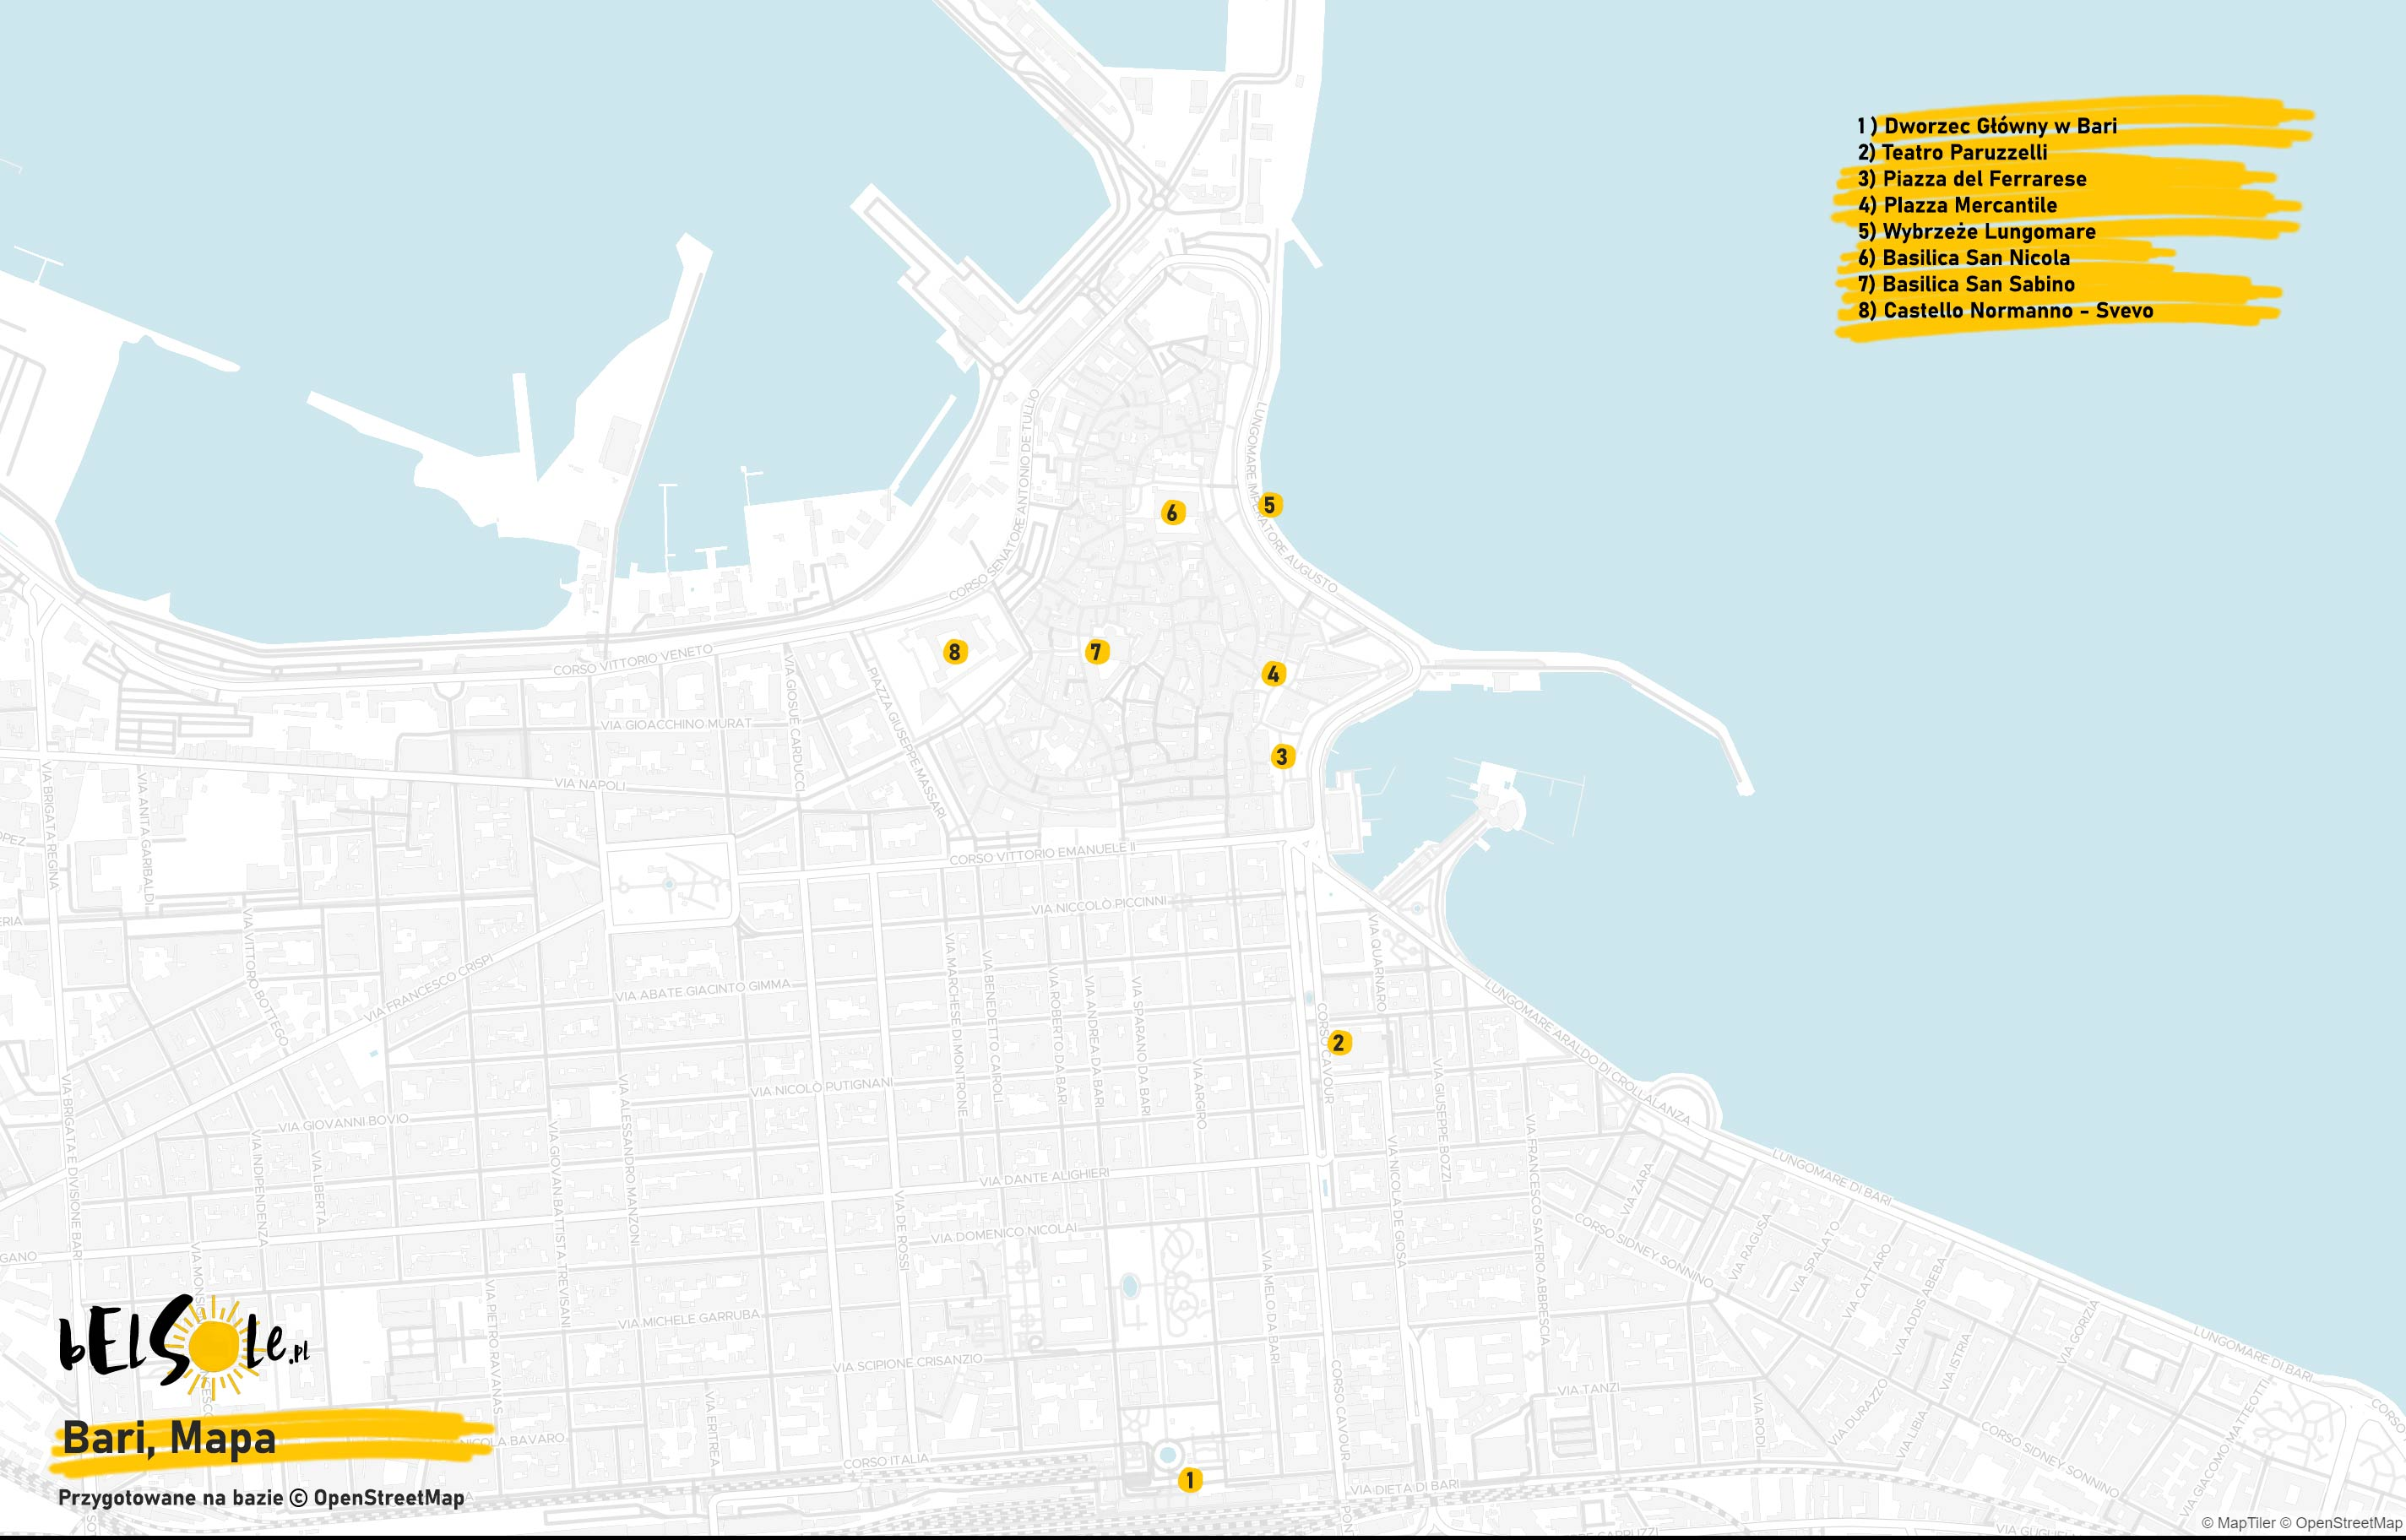 Mapa atrakcji w Bari